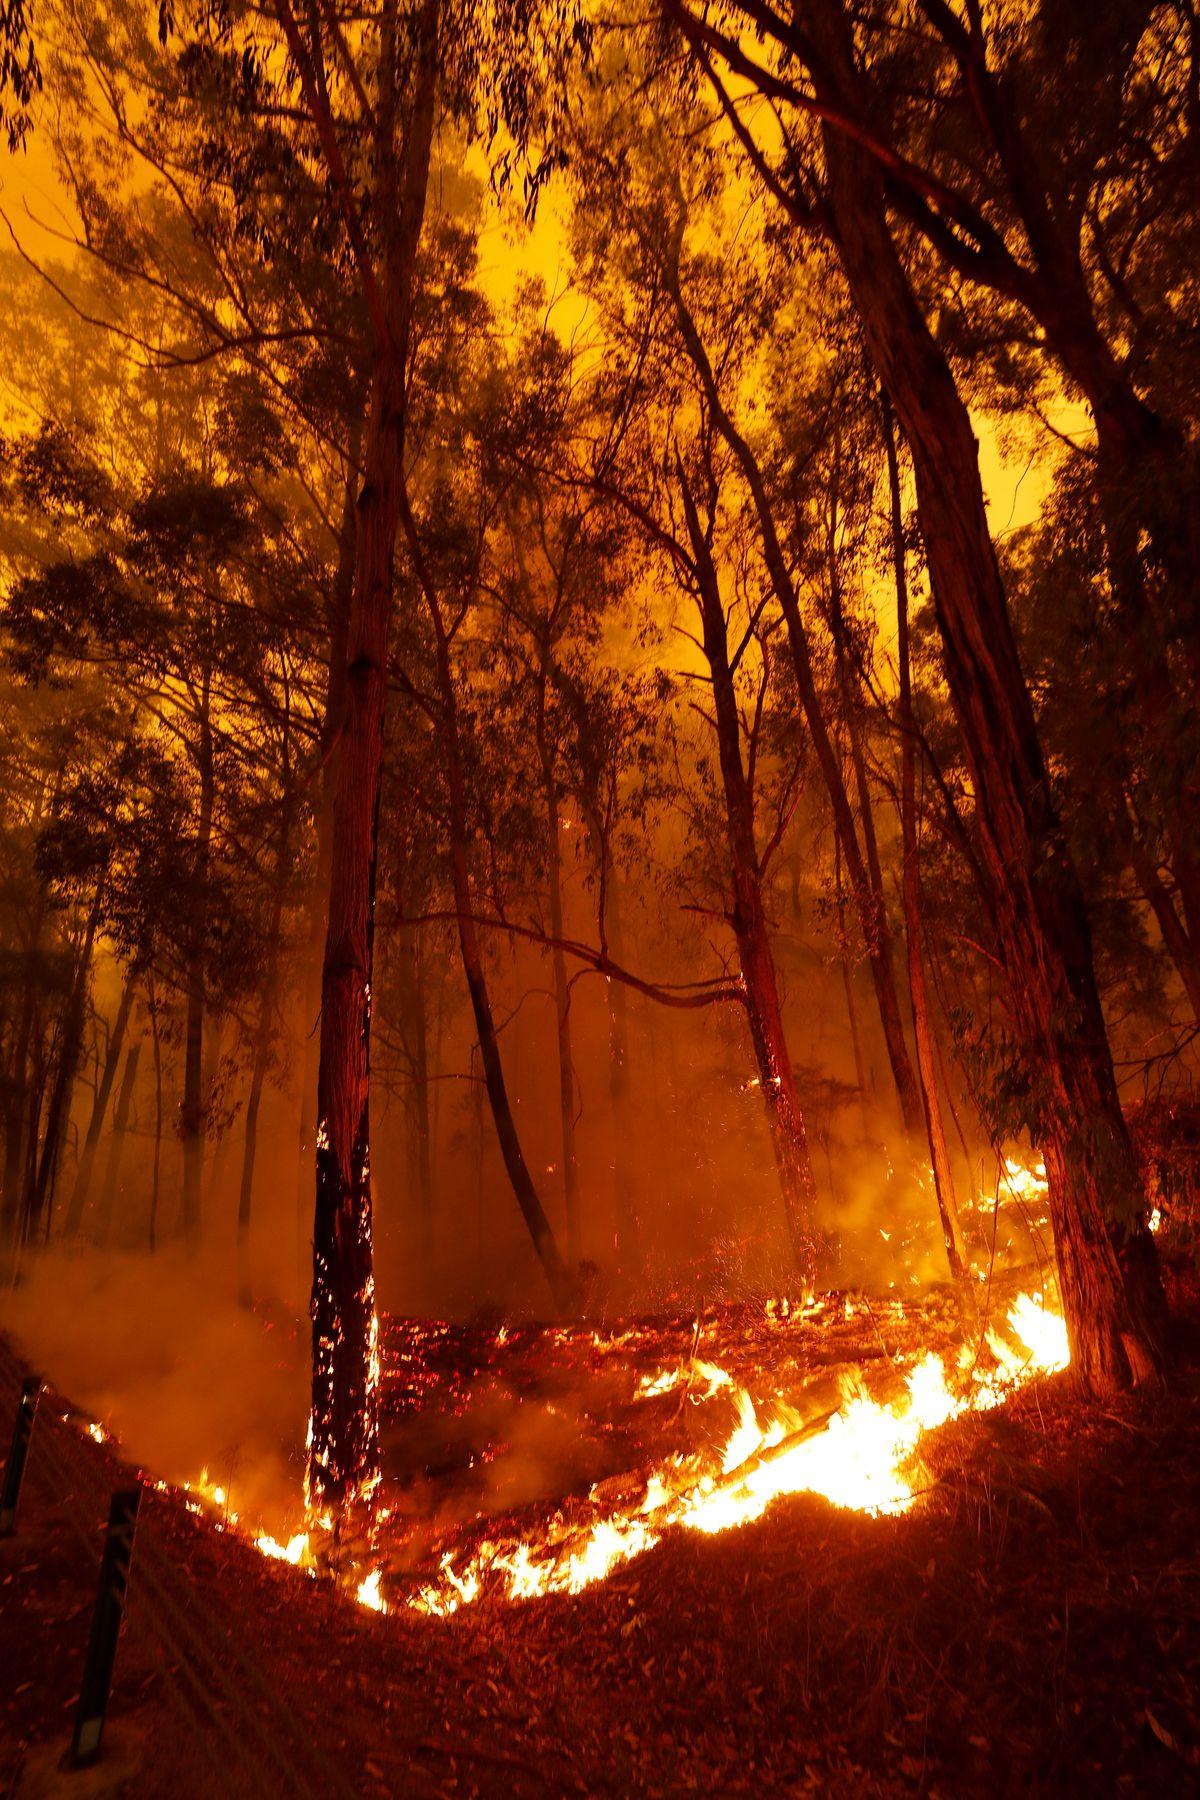 Katastrofalni požar u Australiji - Page 2 Australia_fires_003